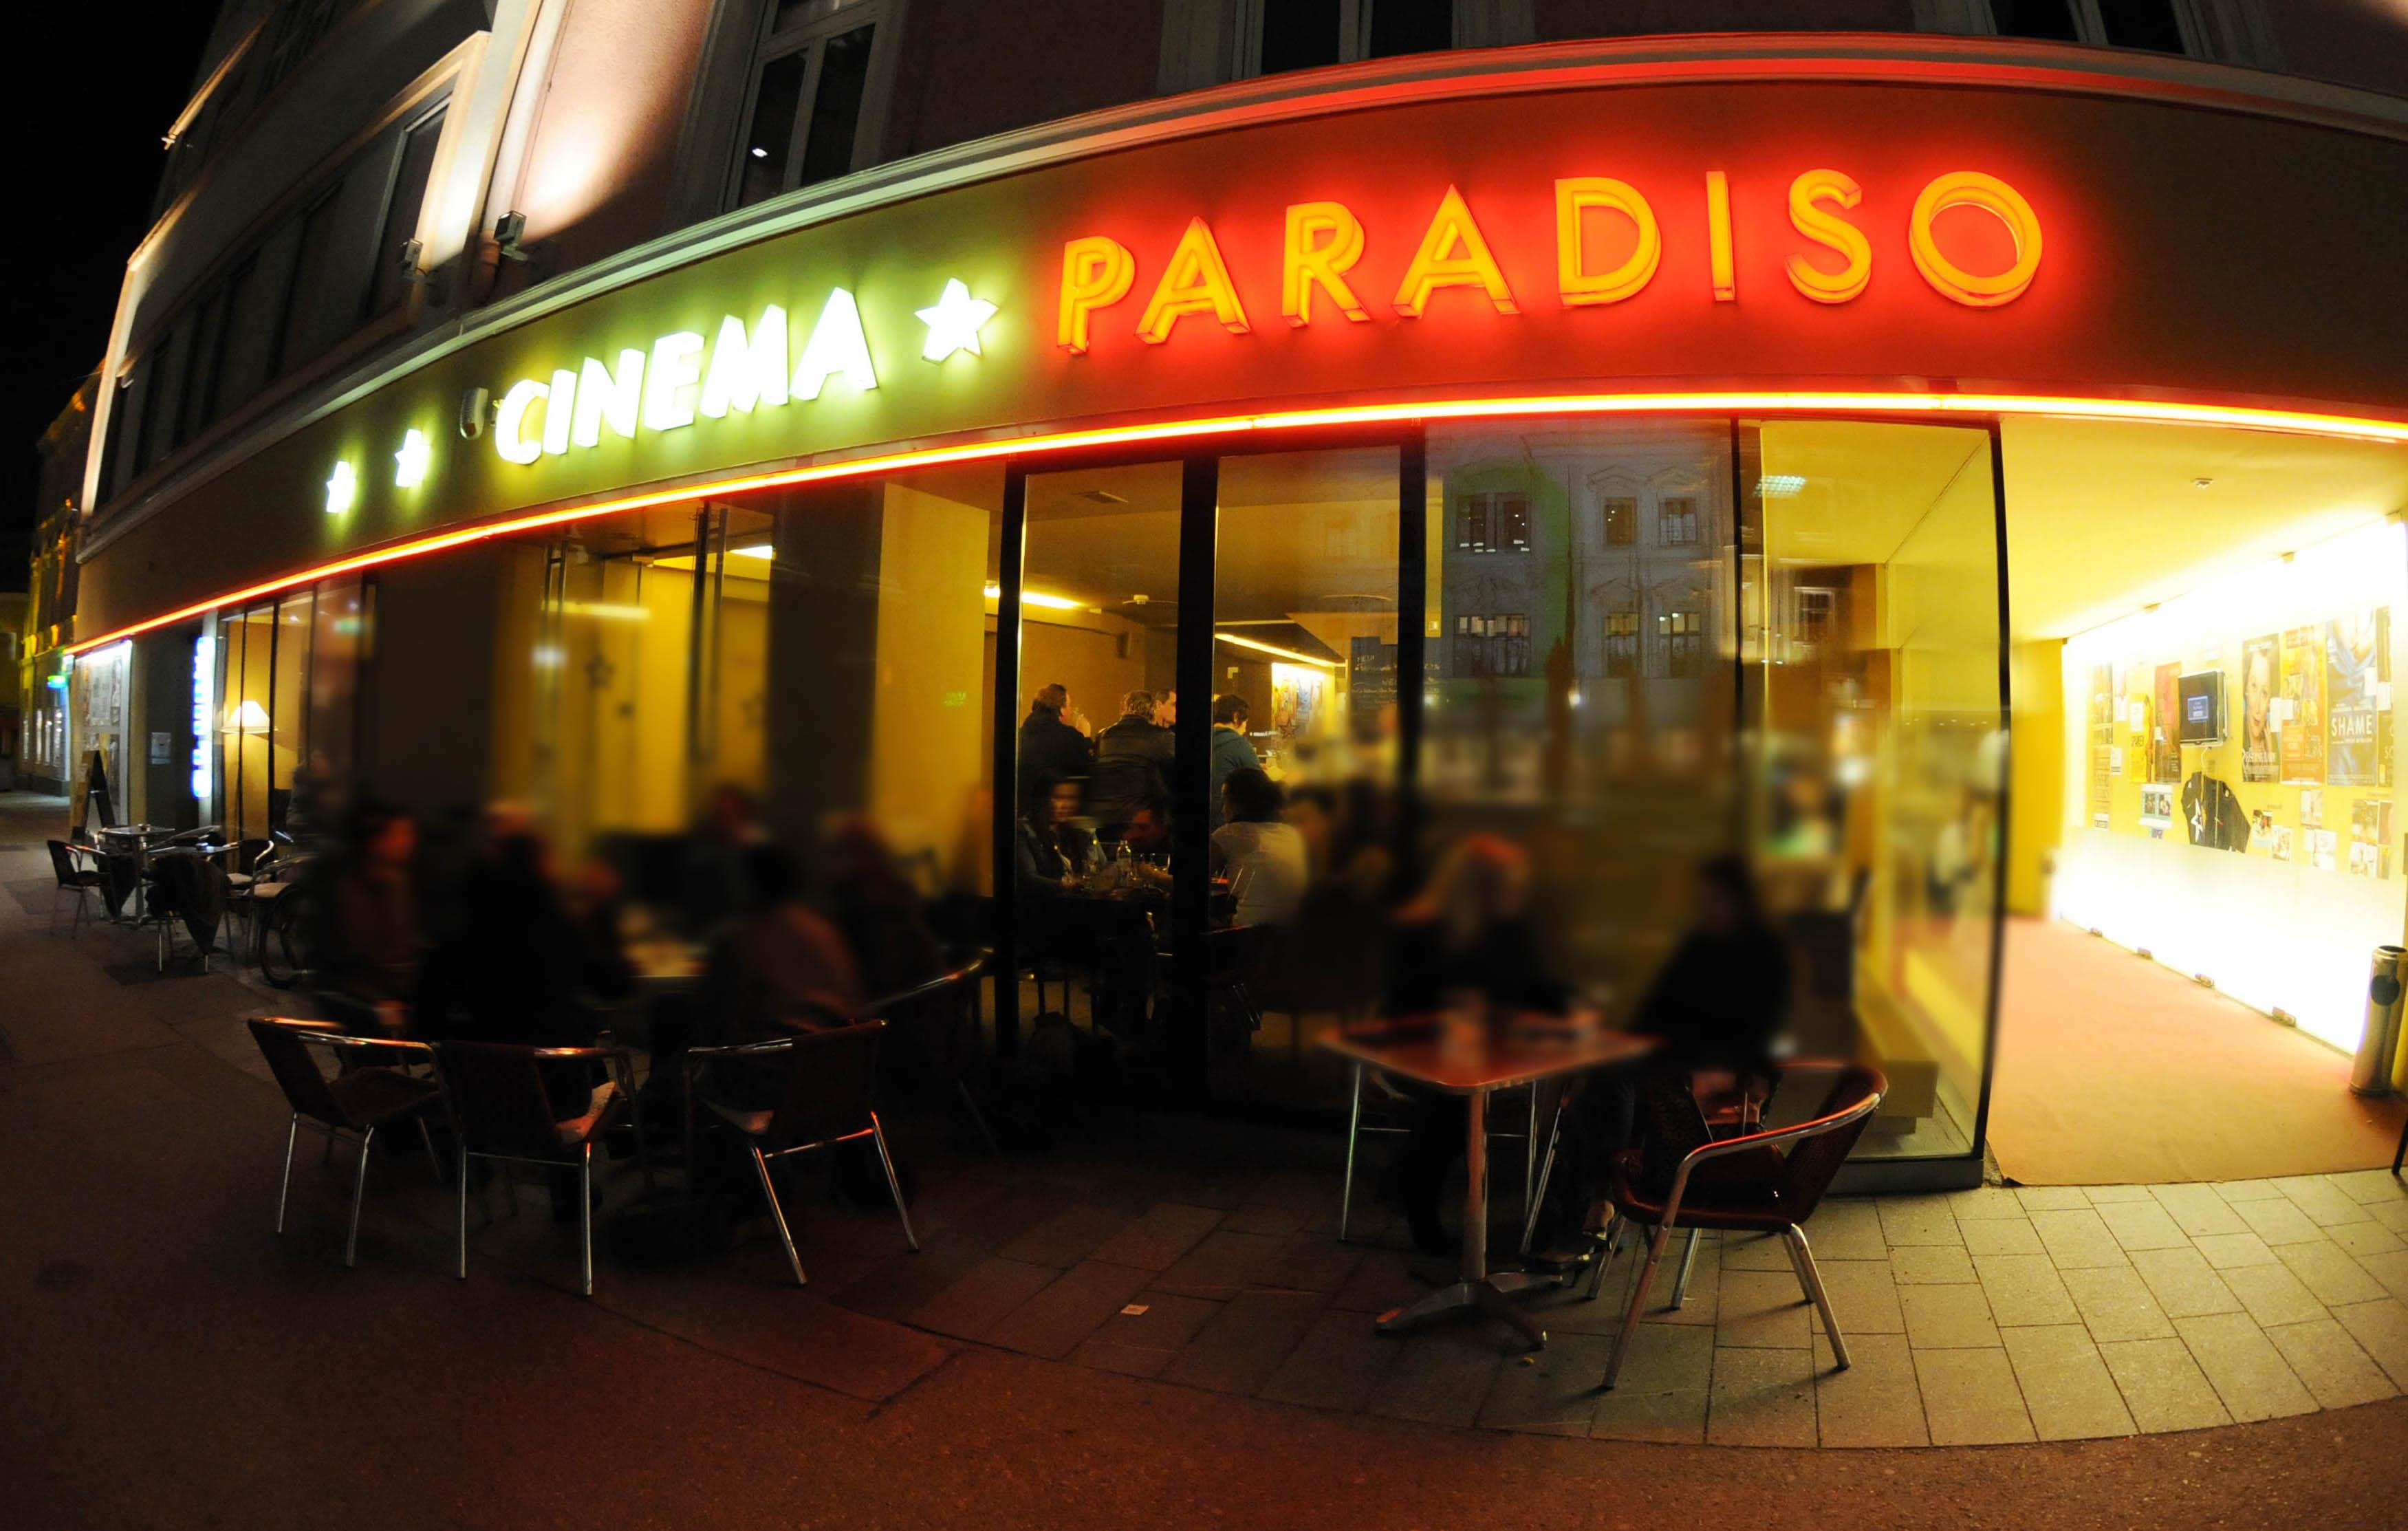 Andrea Reischer/Cinema Paradiso